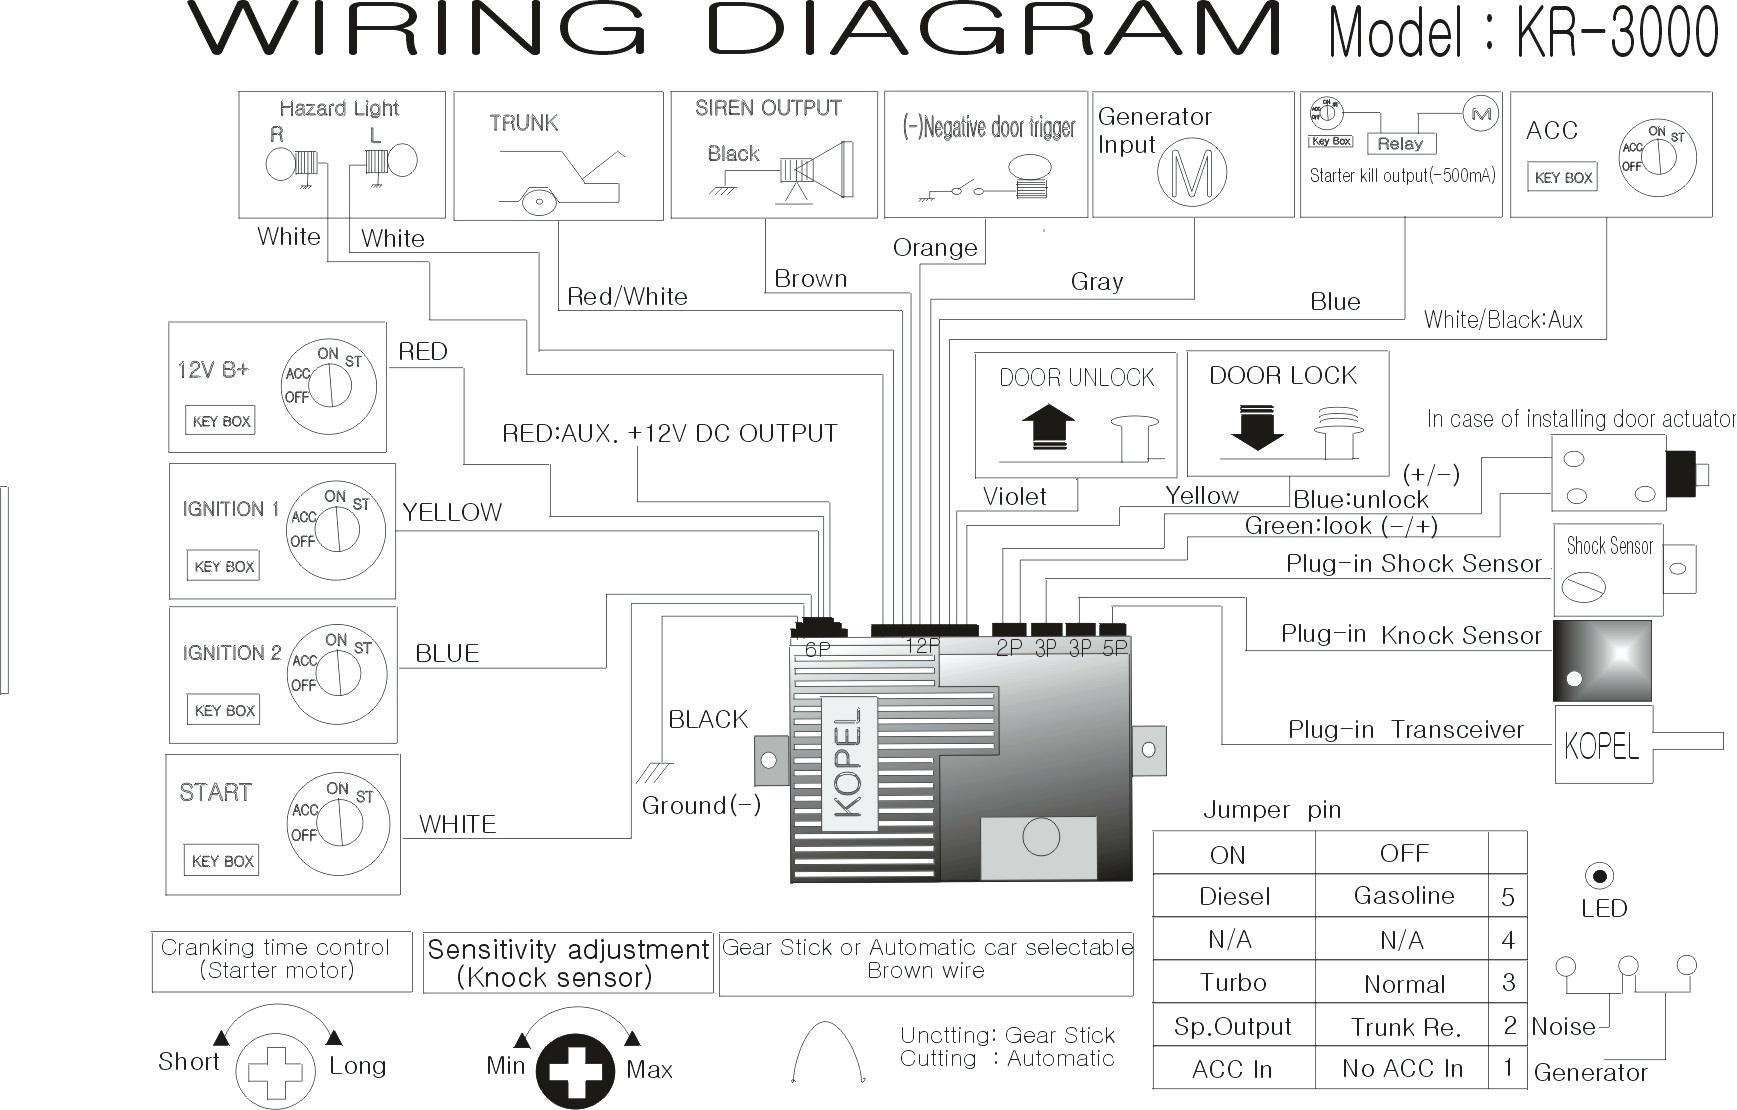 Audiovox Car Alarm Wiring Diagram Car Security System Wiring Diagram Copy Wiring Diagram for Ceiling Of Audiovox Car Alarm Wiring Diagram